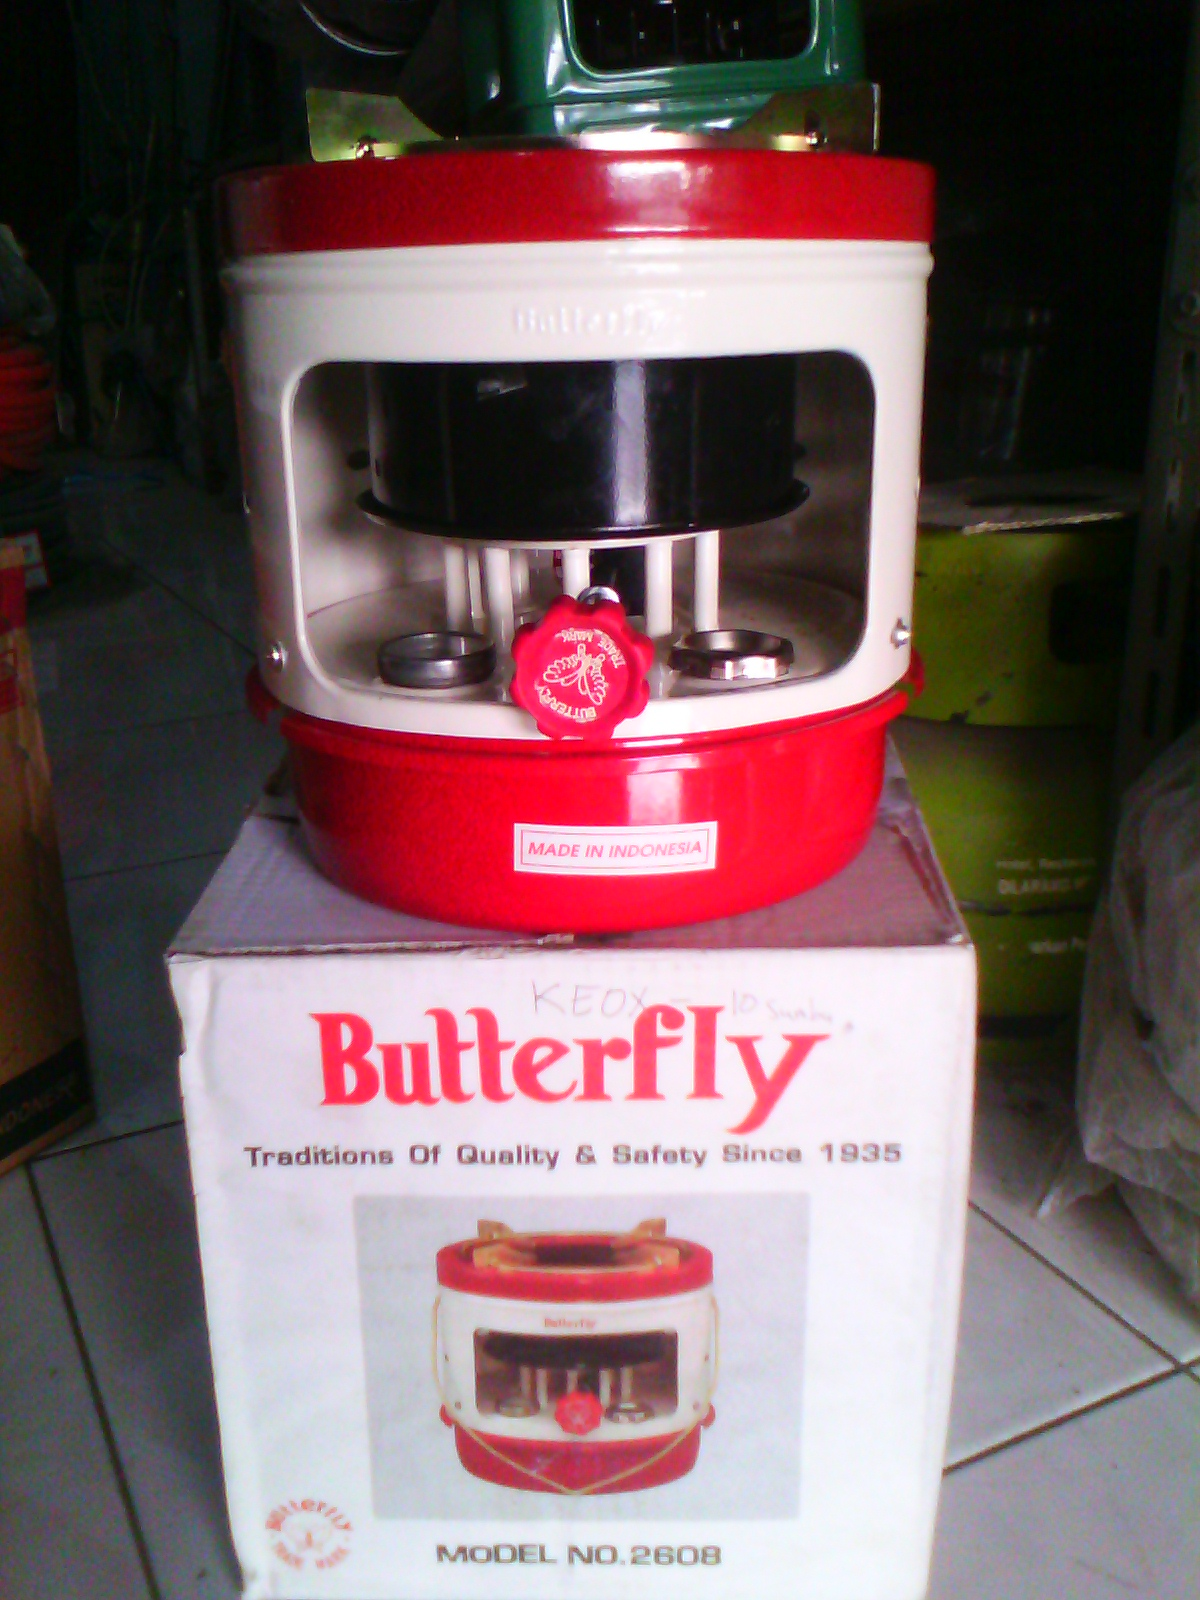 Jual Kompor Minyak Tanah Butterfly 2608